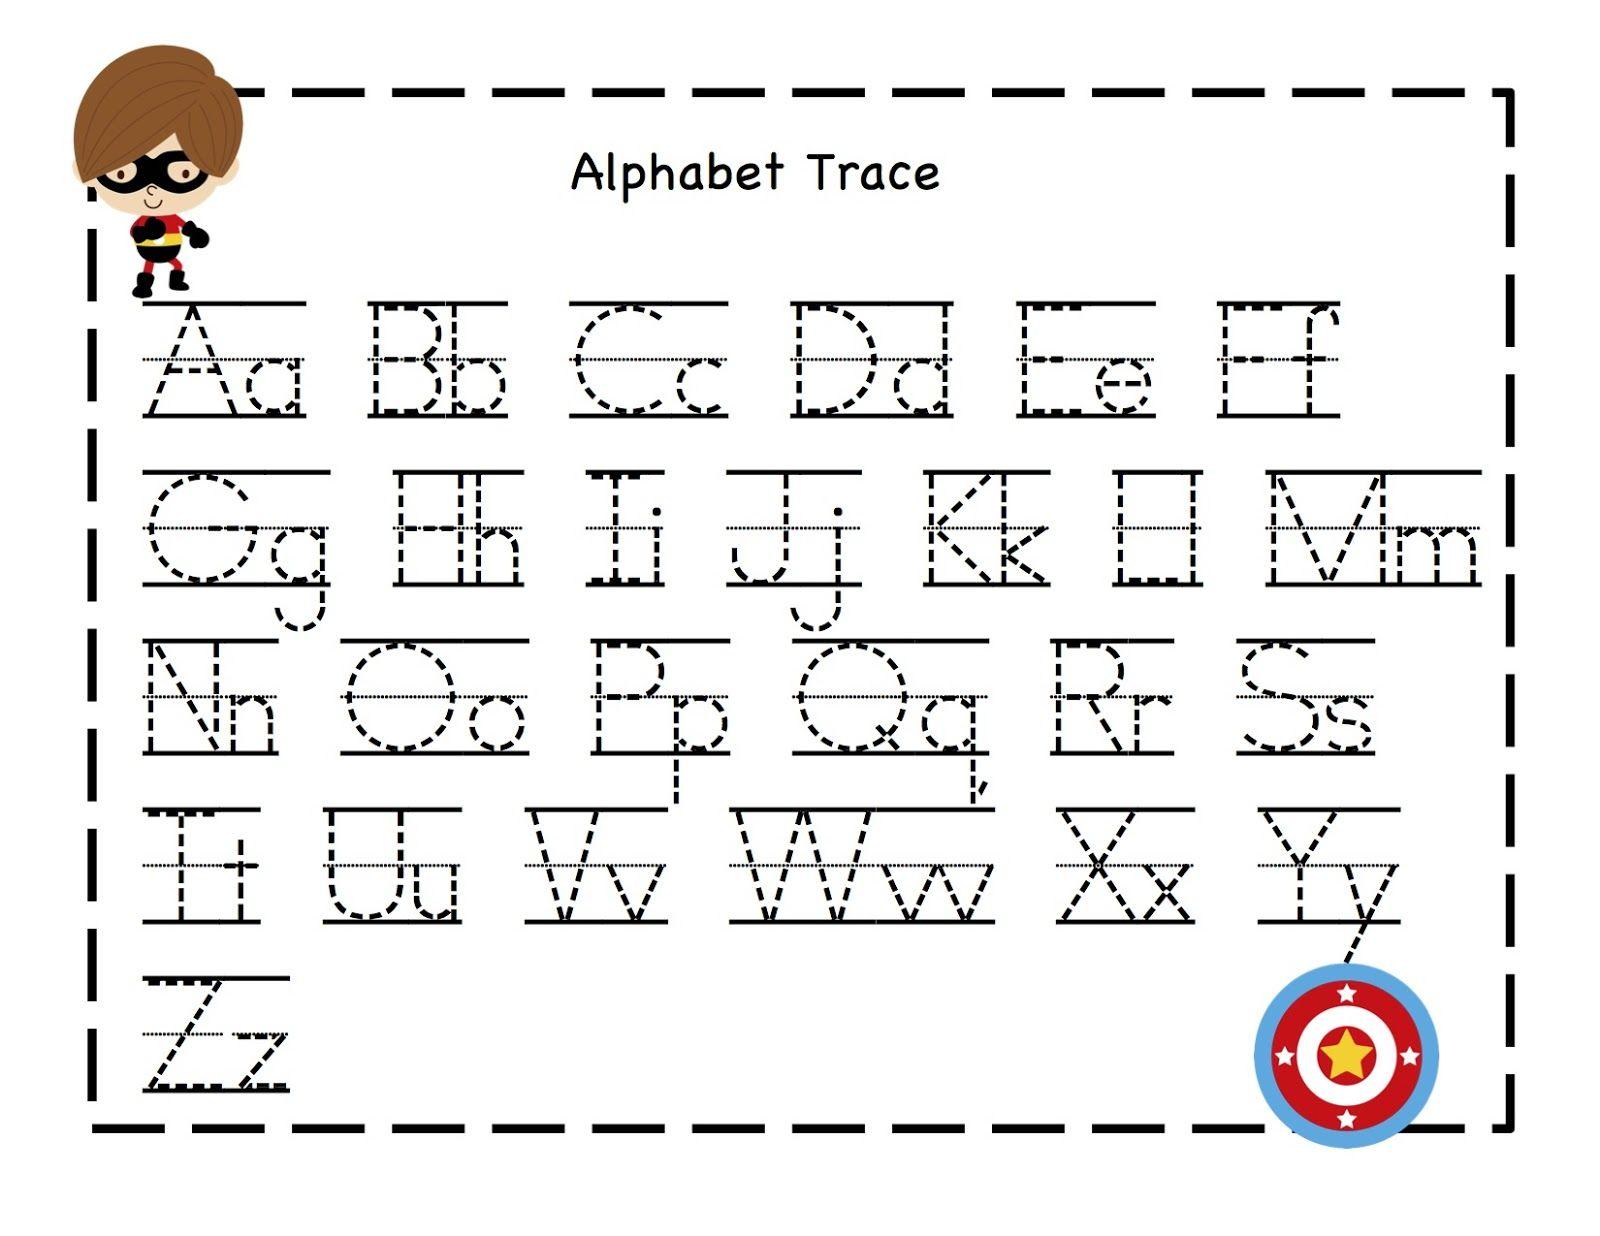 Super Hero Abc Tracing Sheets 1 | Alphabet Tracing